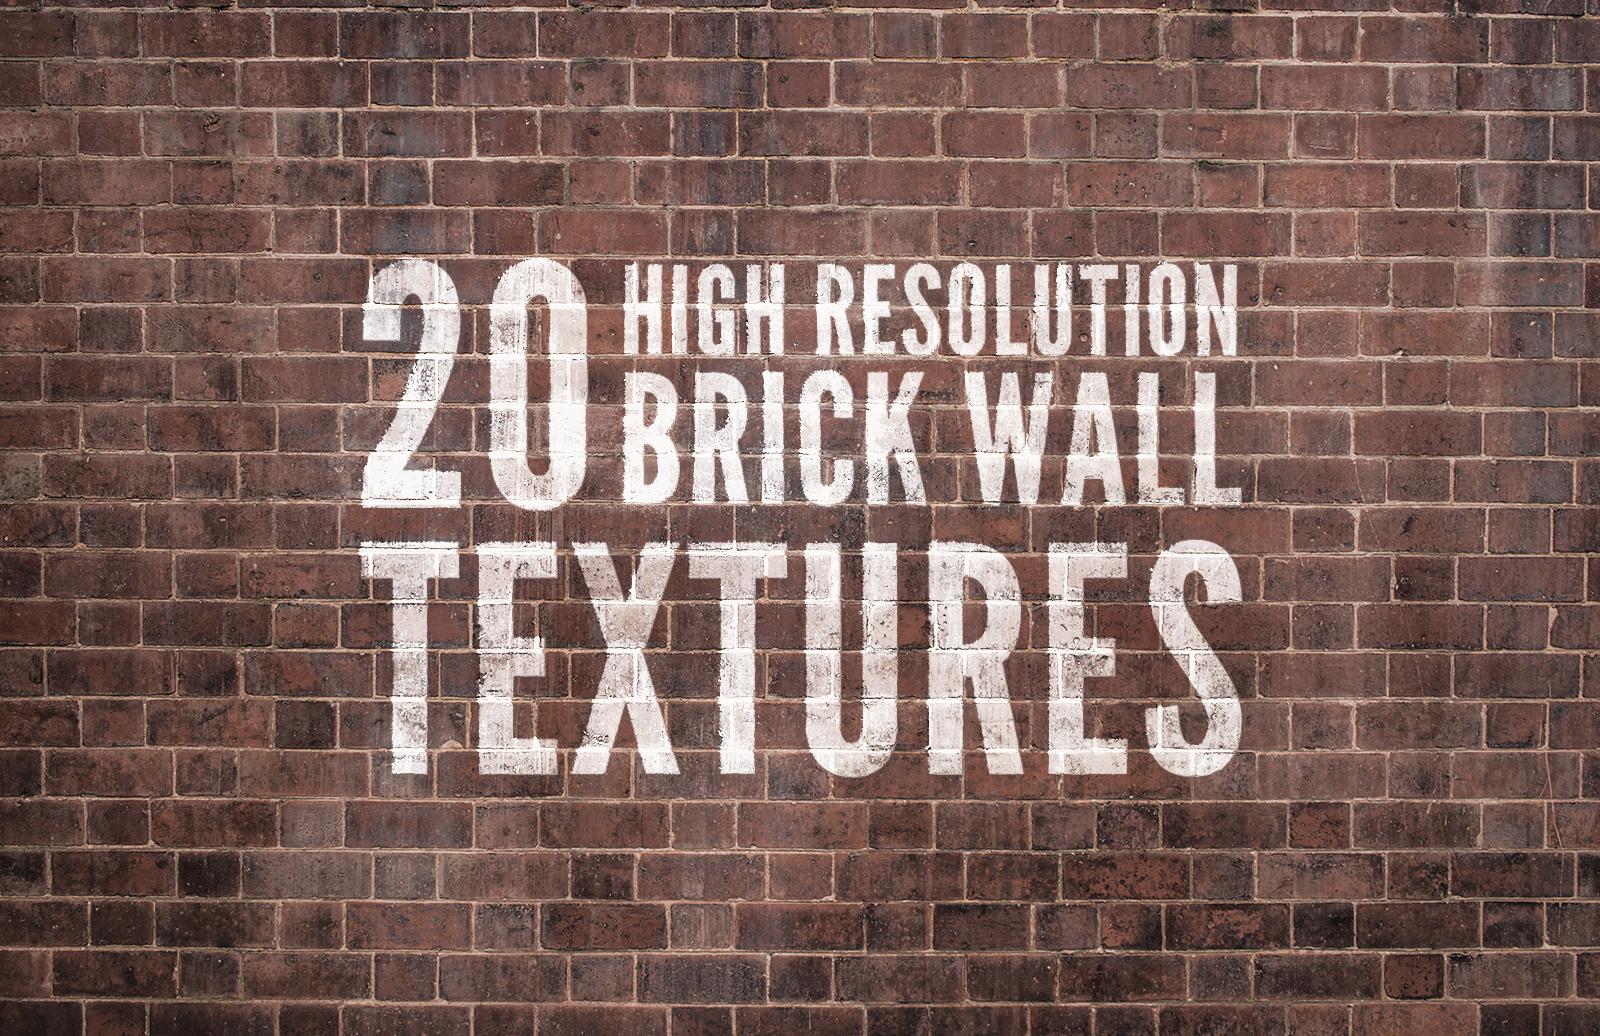 20 High Resolution Brick Wall Textures